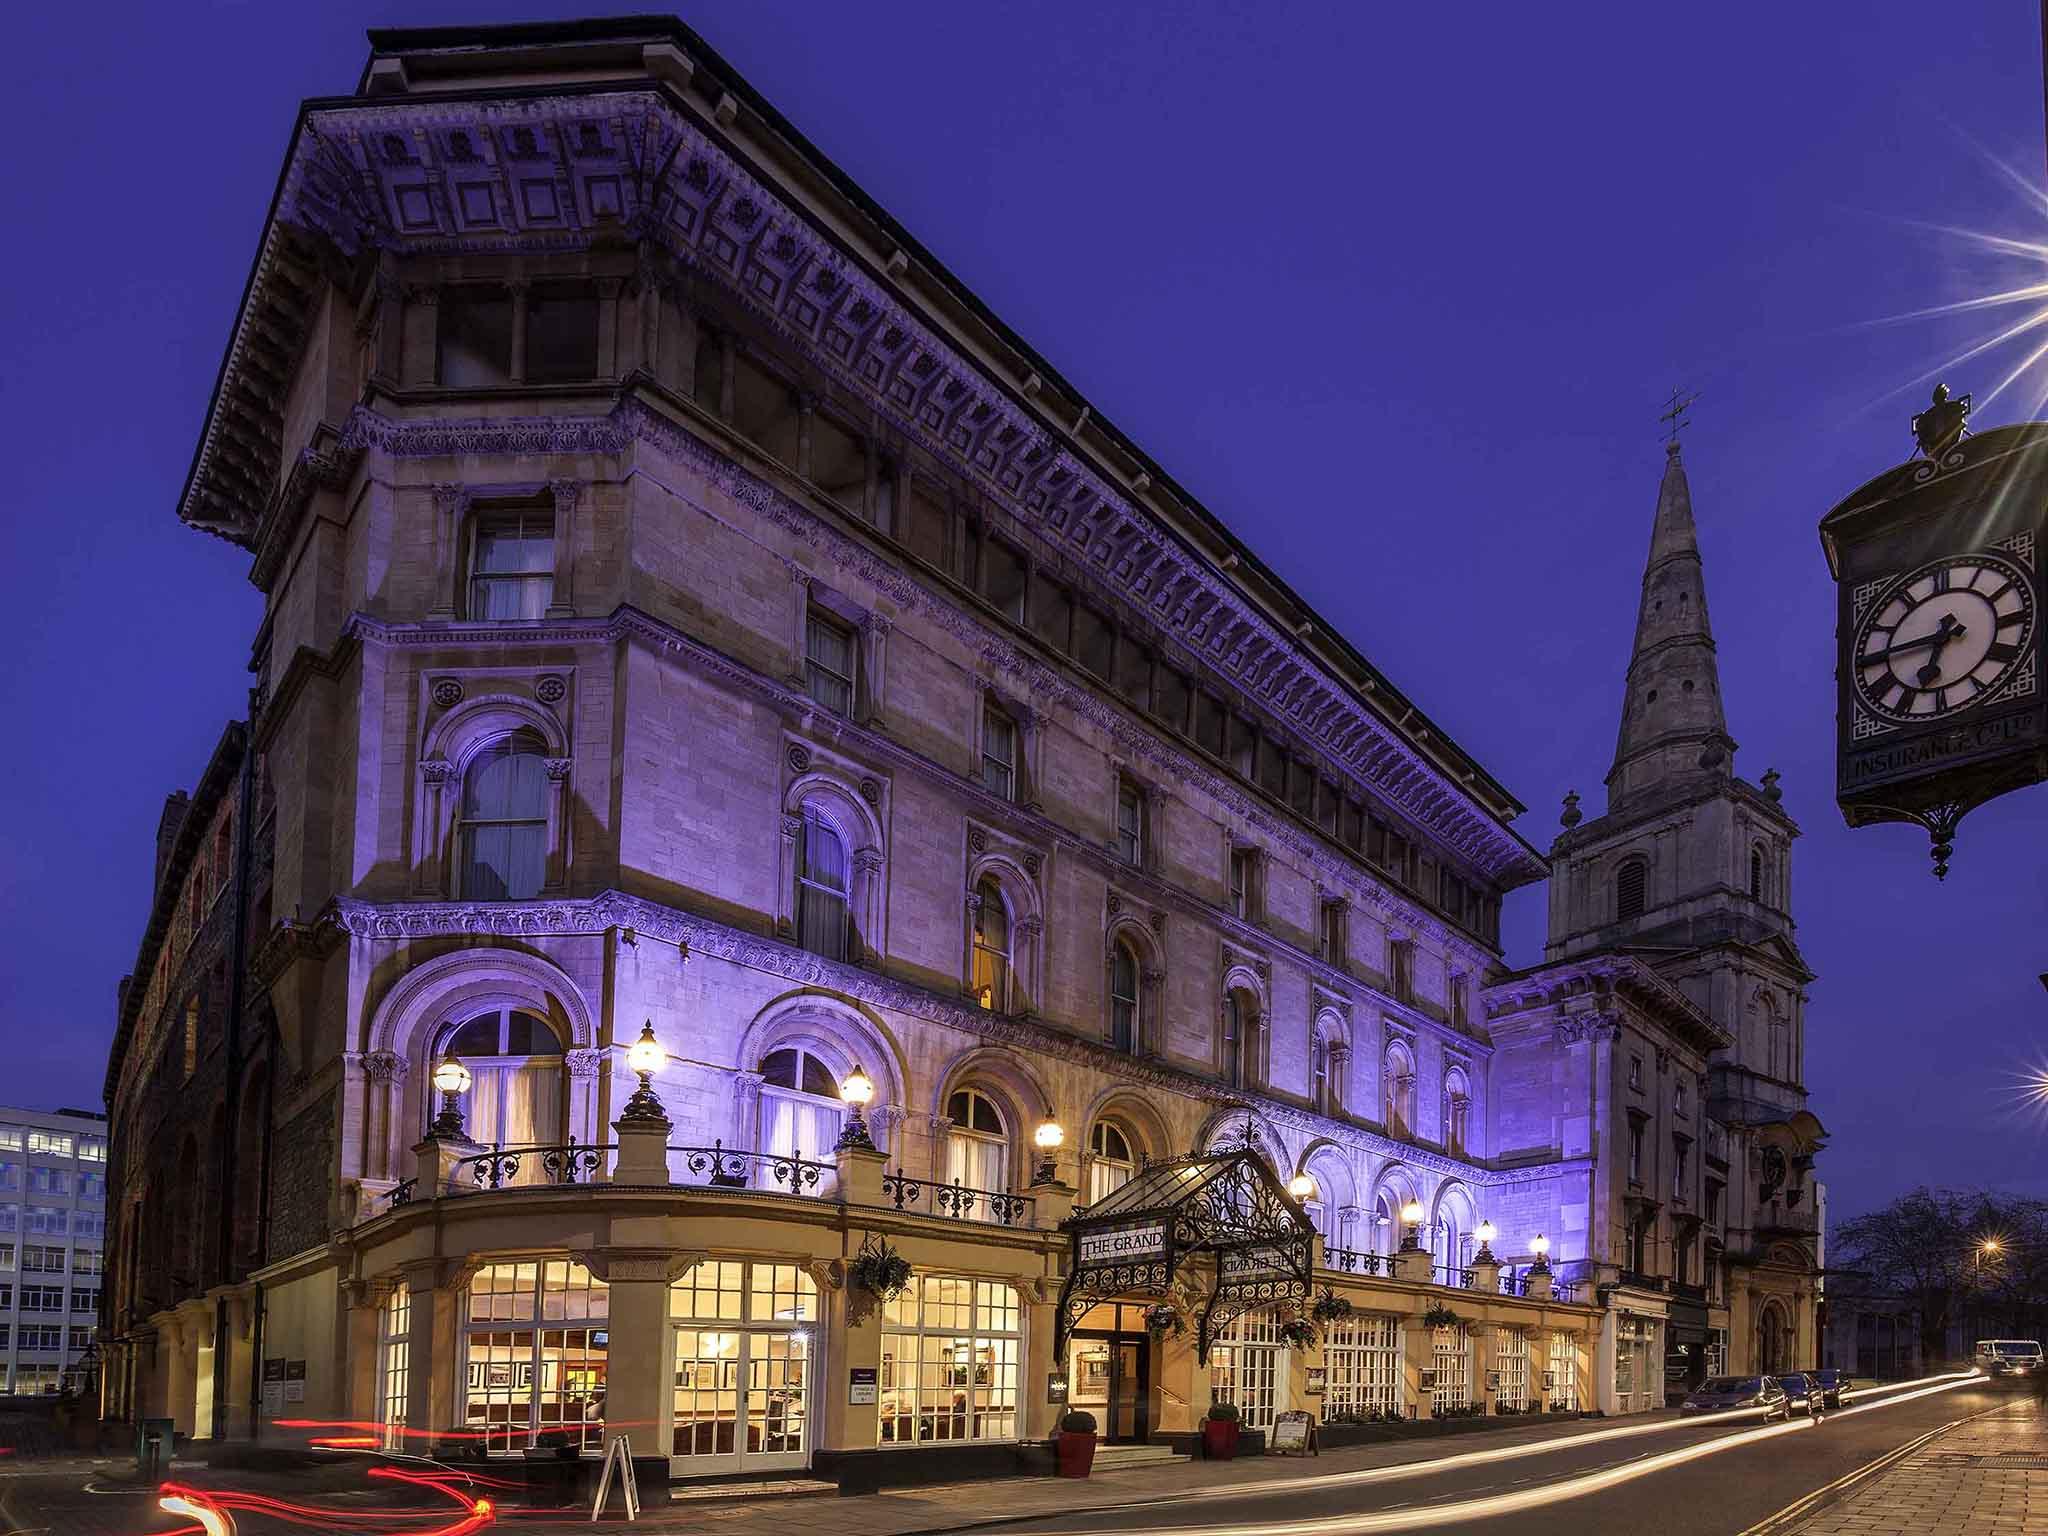 Hotel – Mercure Bristol Grand Hotel (ristrutturazione recente)